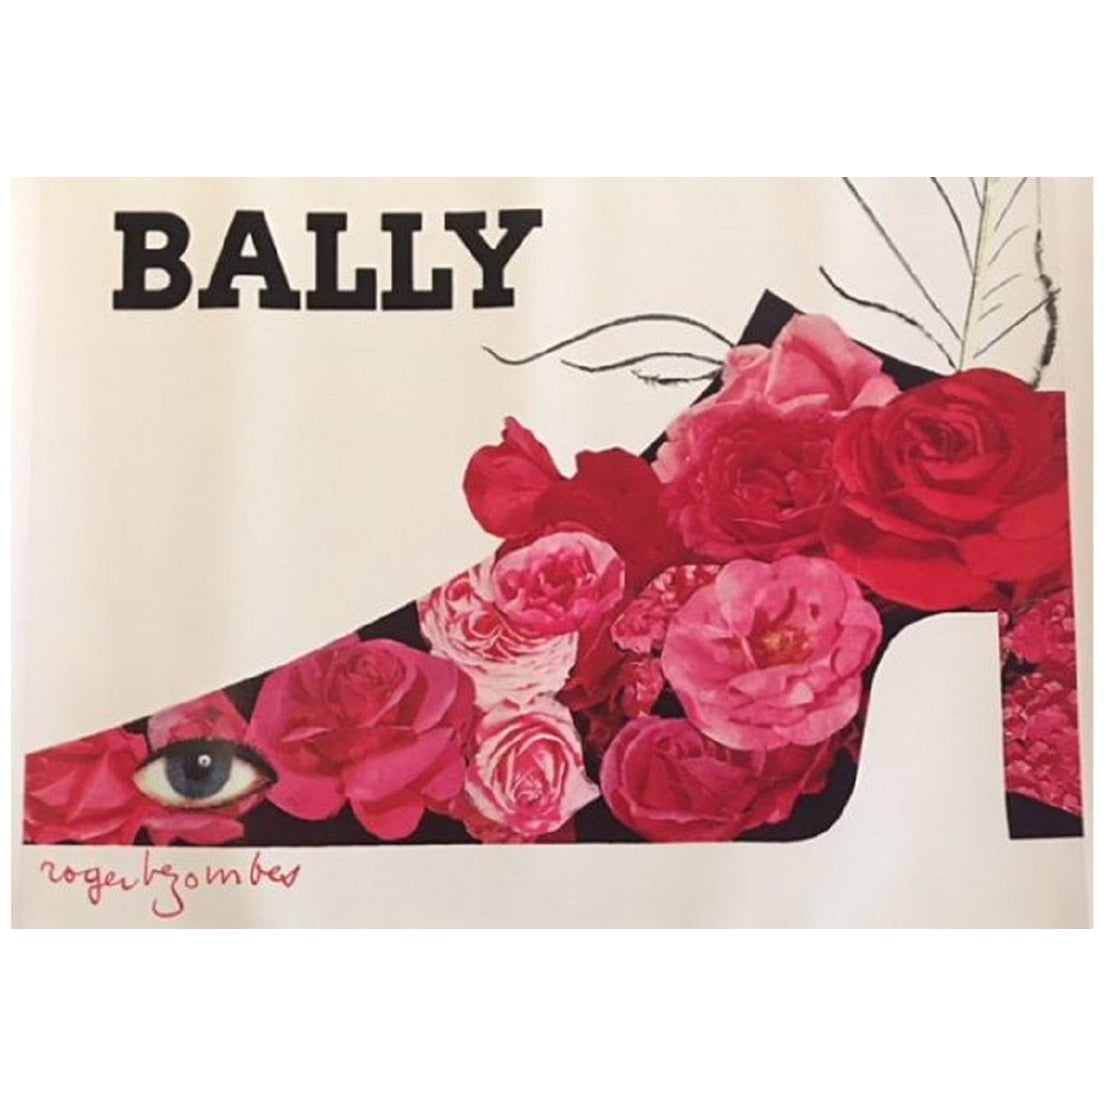 Bally Plume Roger Bezombes Original Vintage Poster